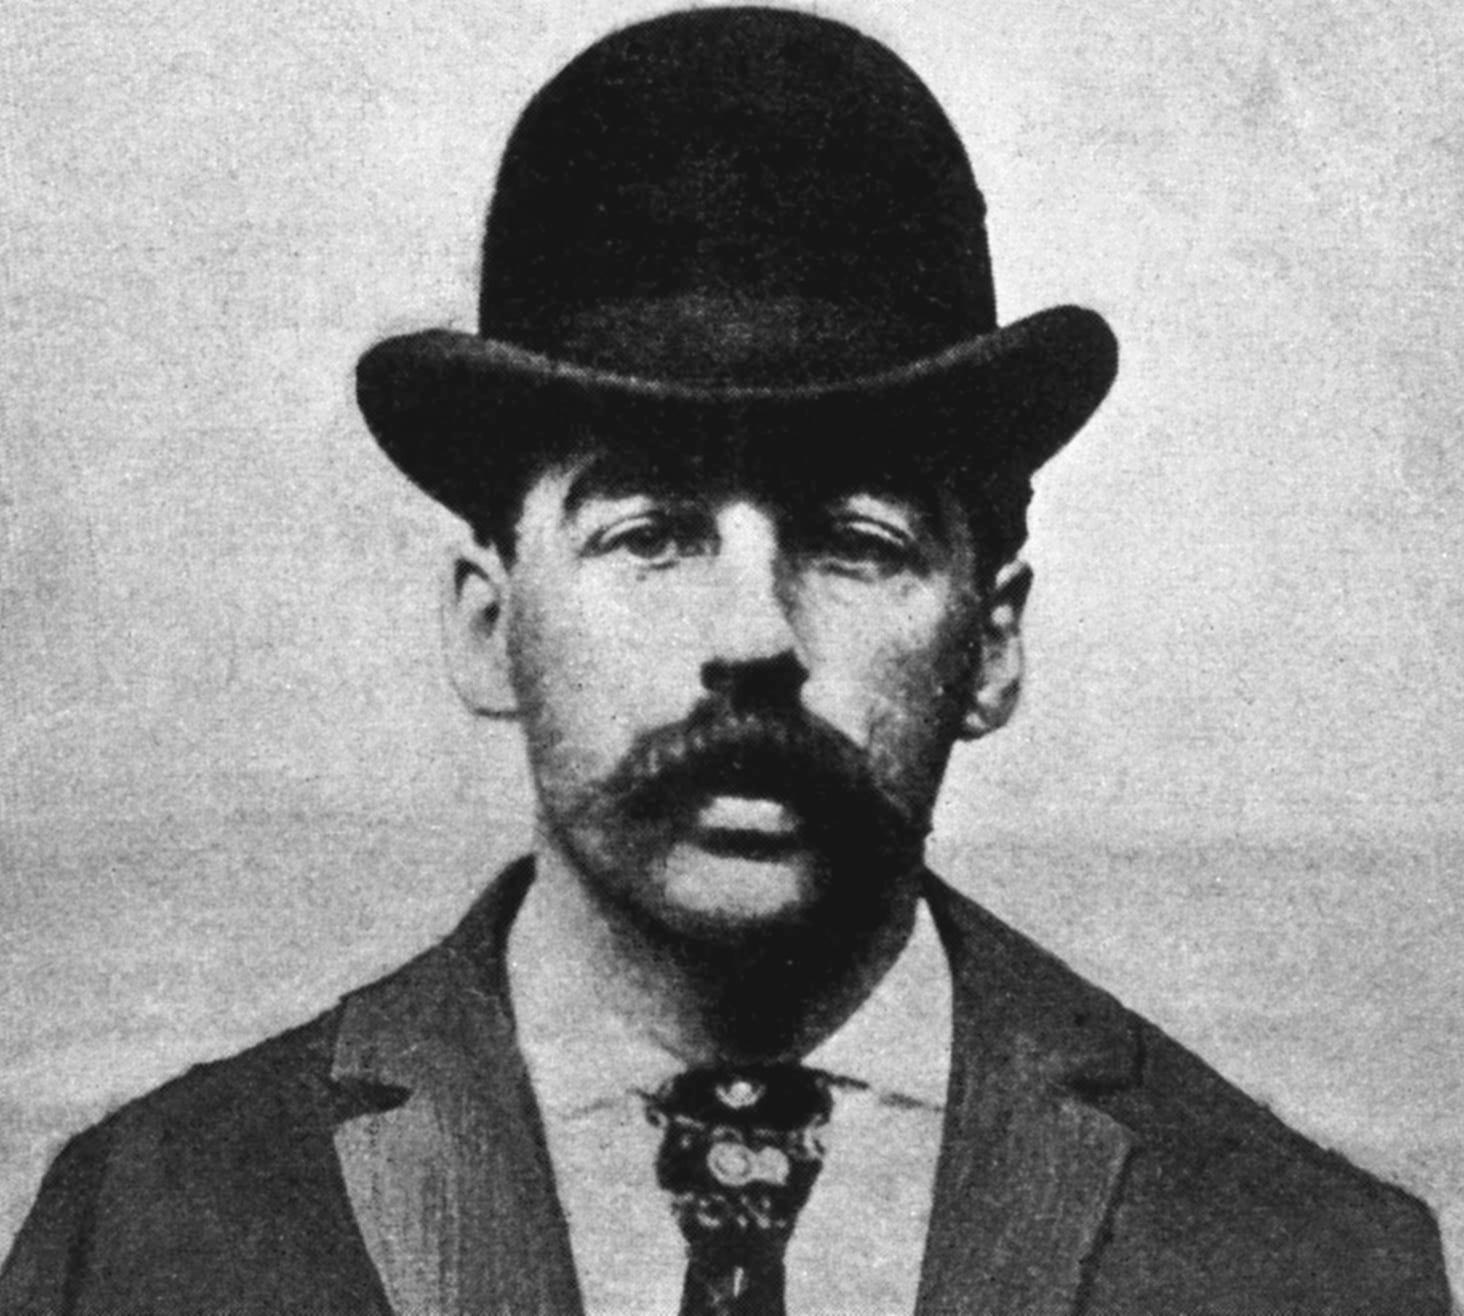 America's First Serial Killer: The Devil In the White City